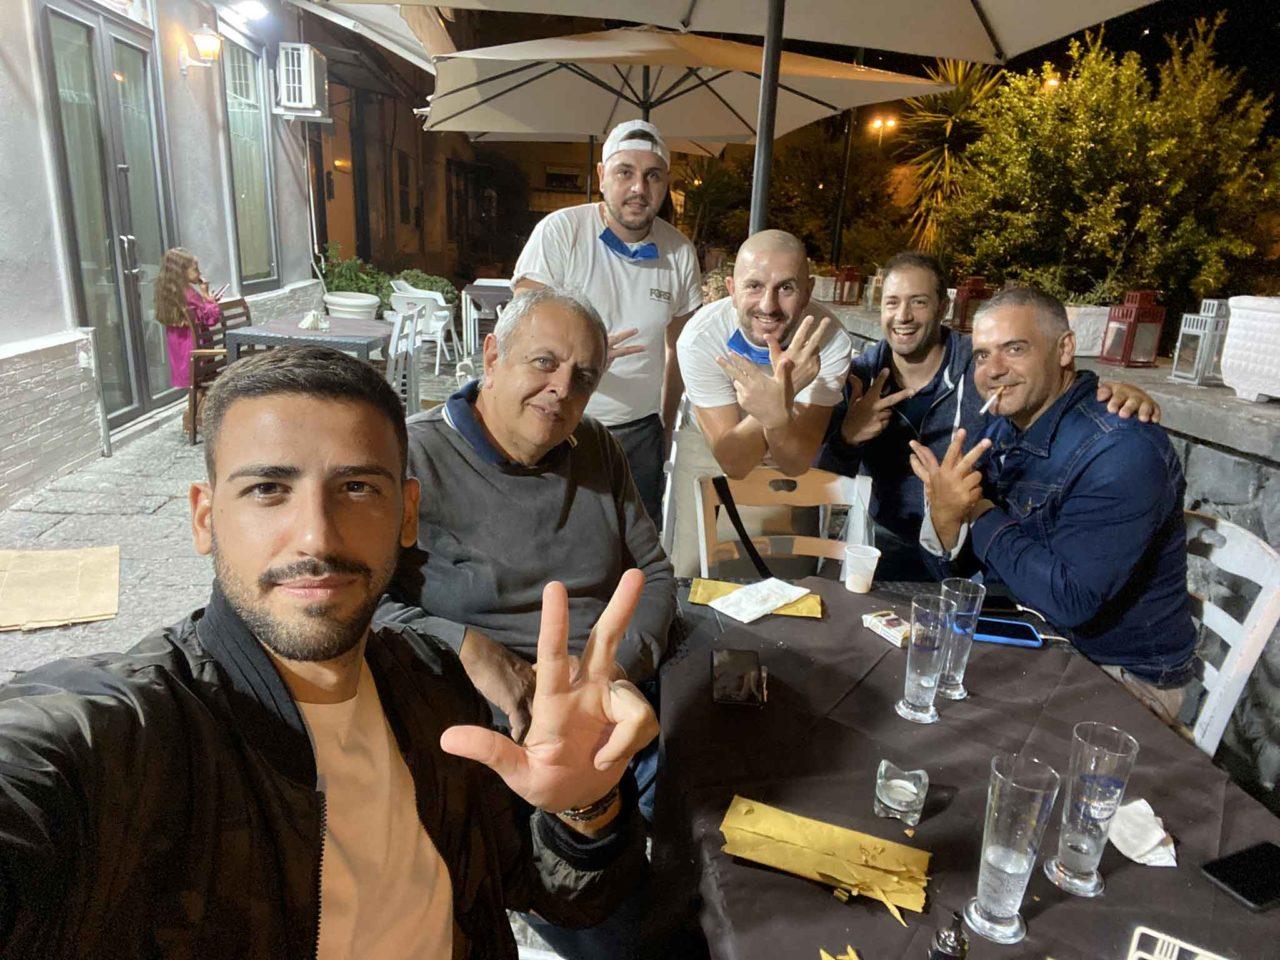 Pizzeria Diametro 33: Vincenzo Pagano con Pizza Napoletana, Campania Food Blog e Mister Mario